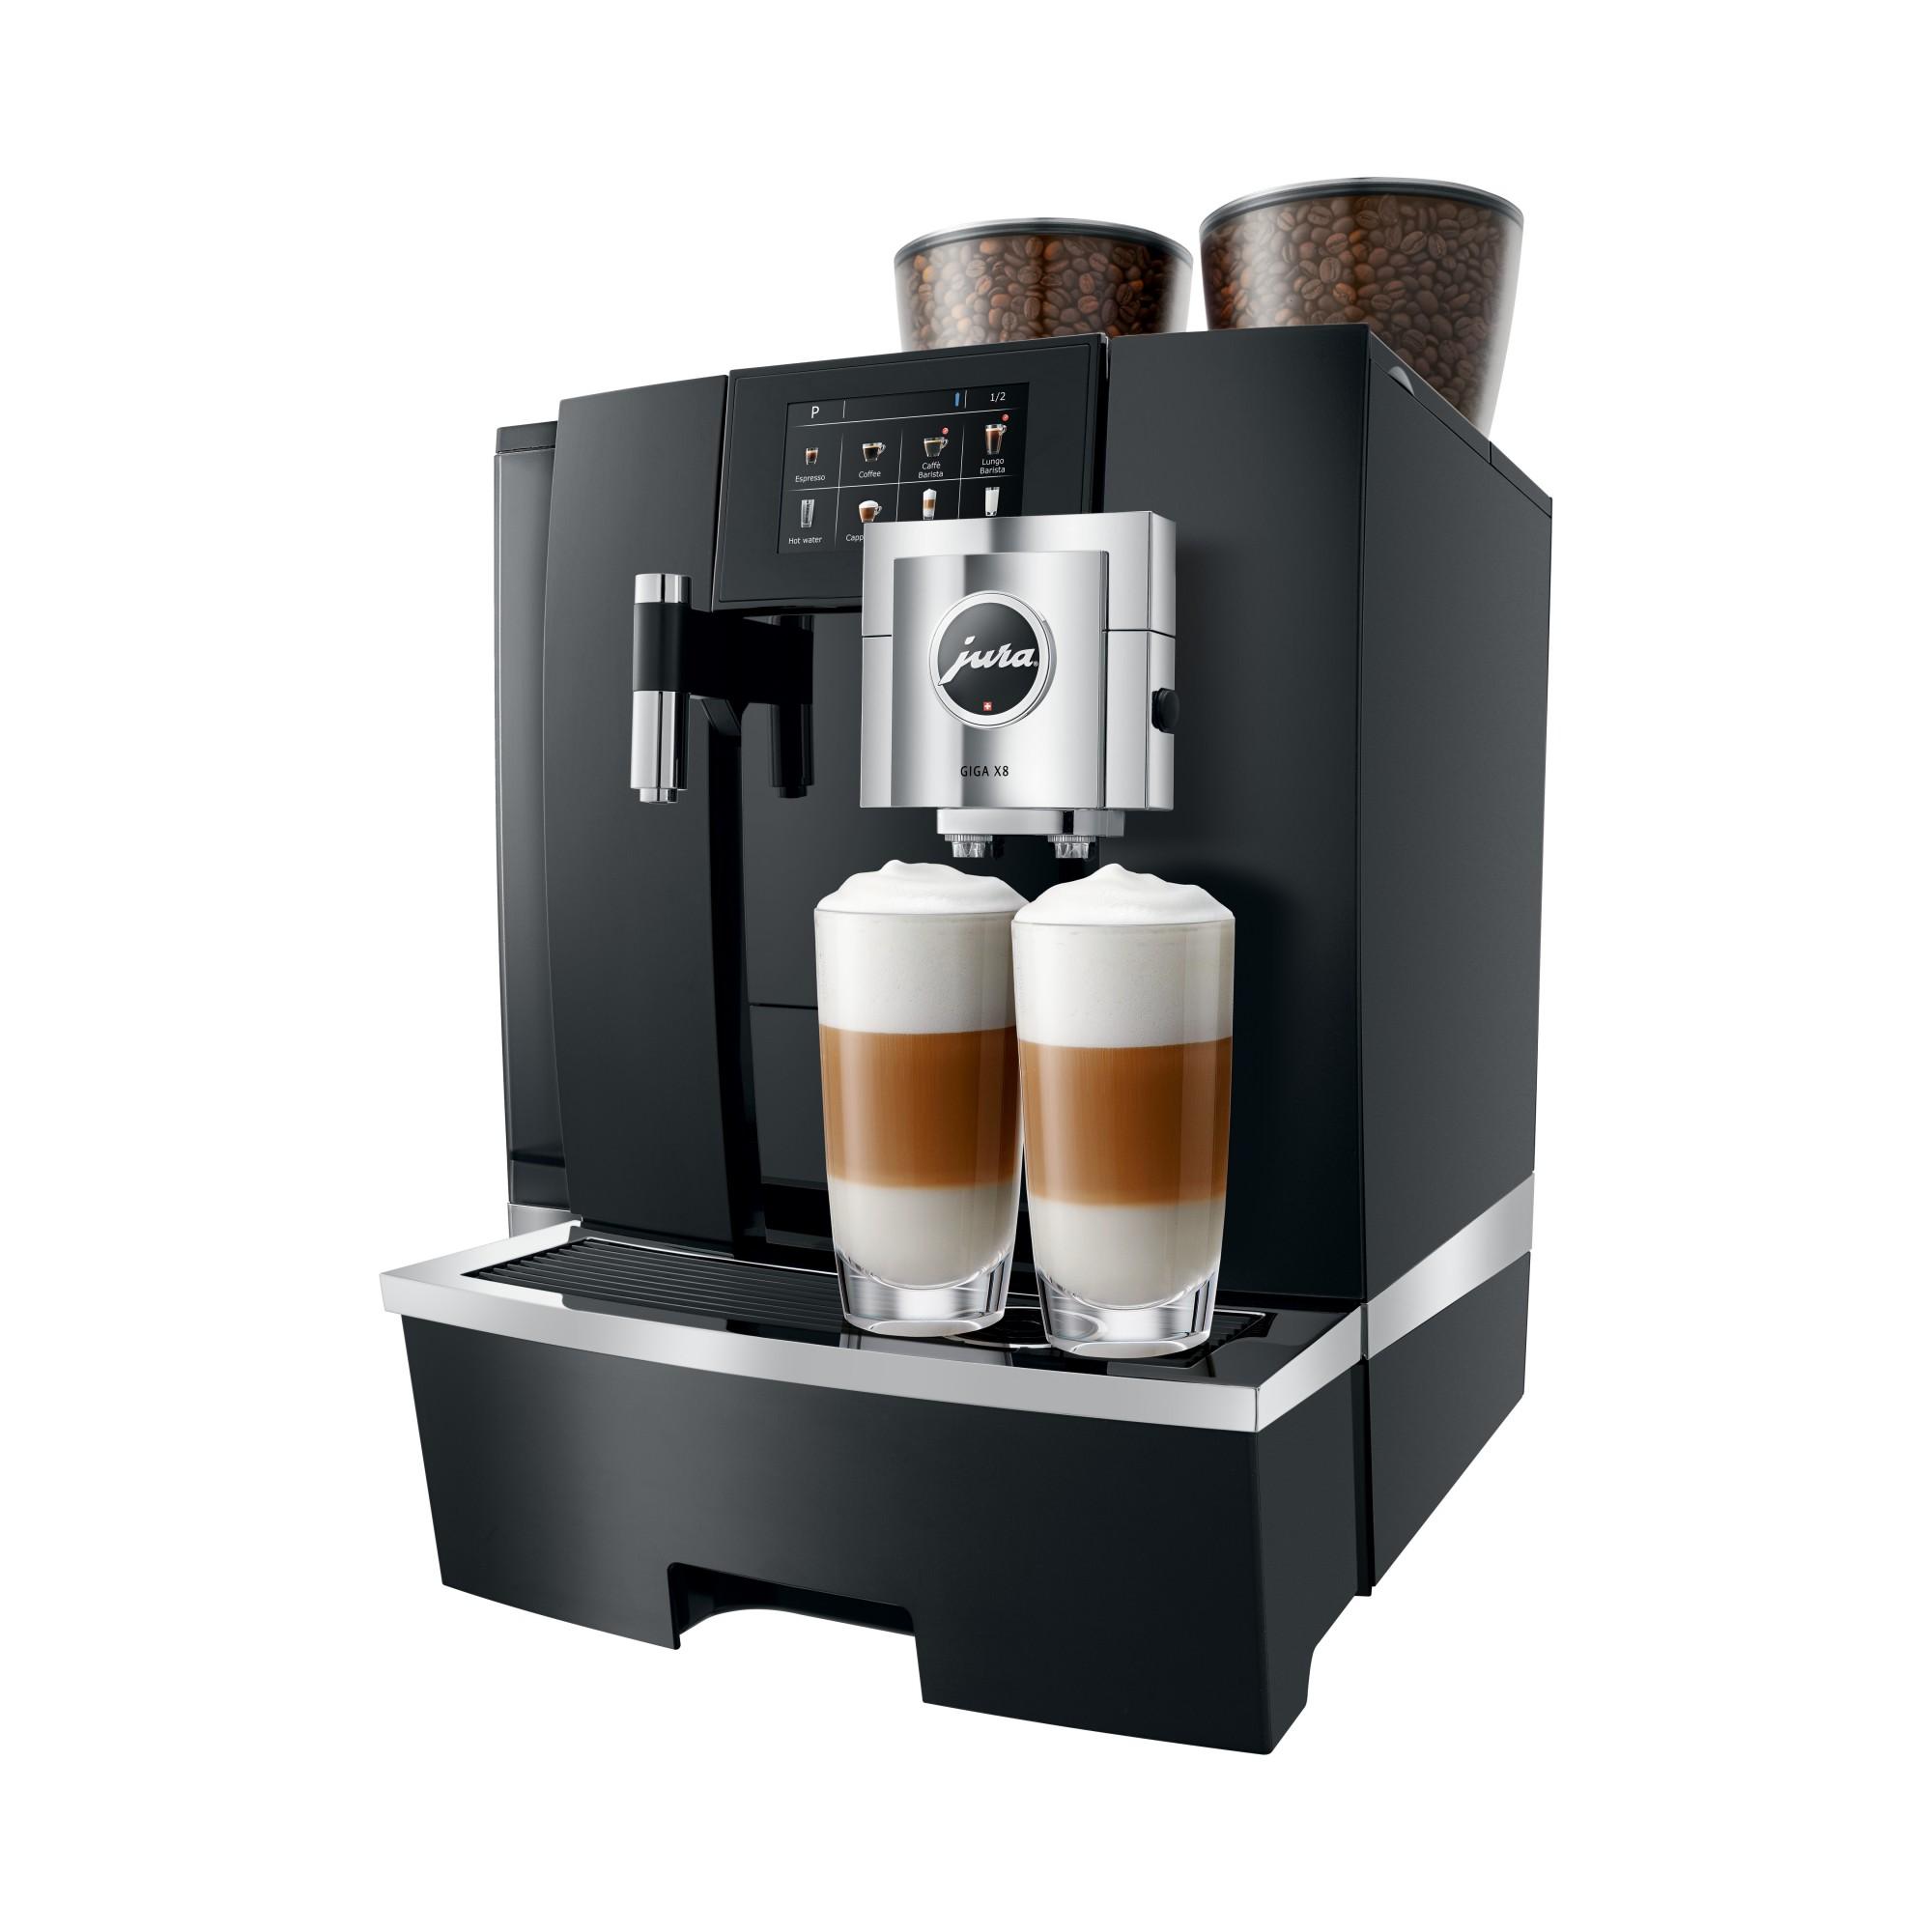 Zakelijke koffiemachine die latte macchiato kan maken